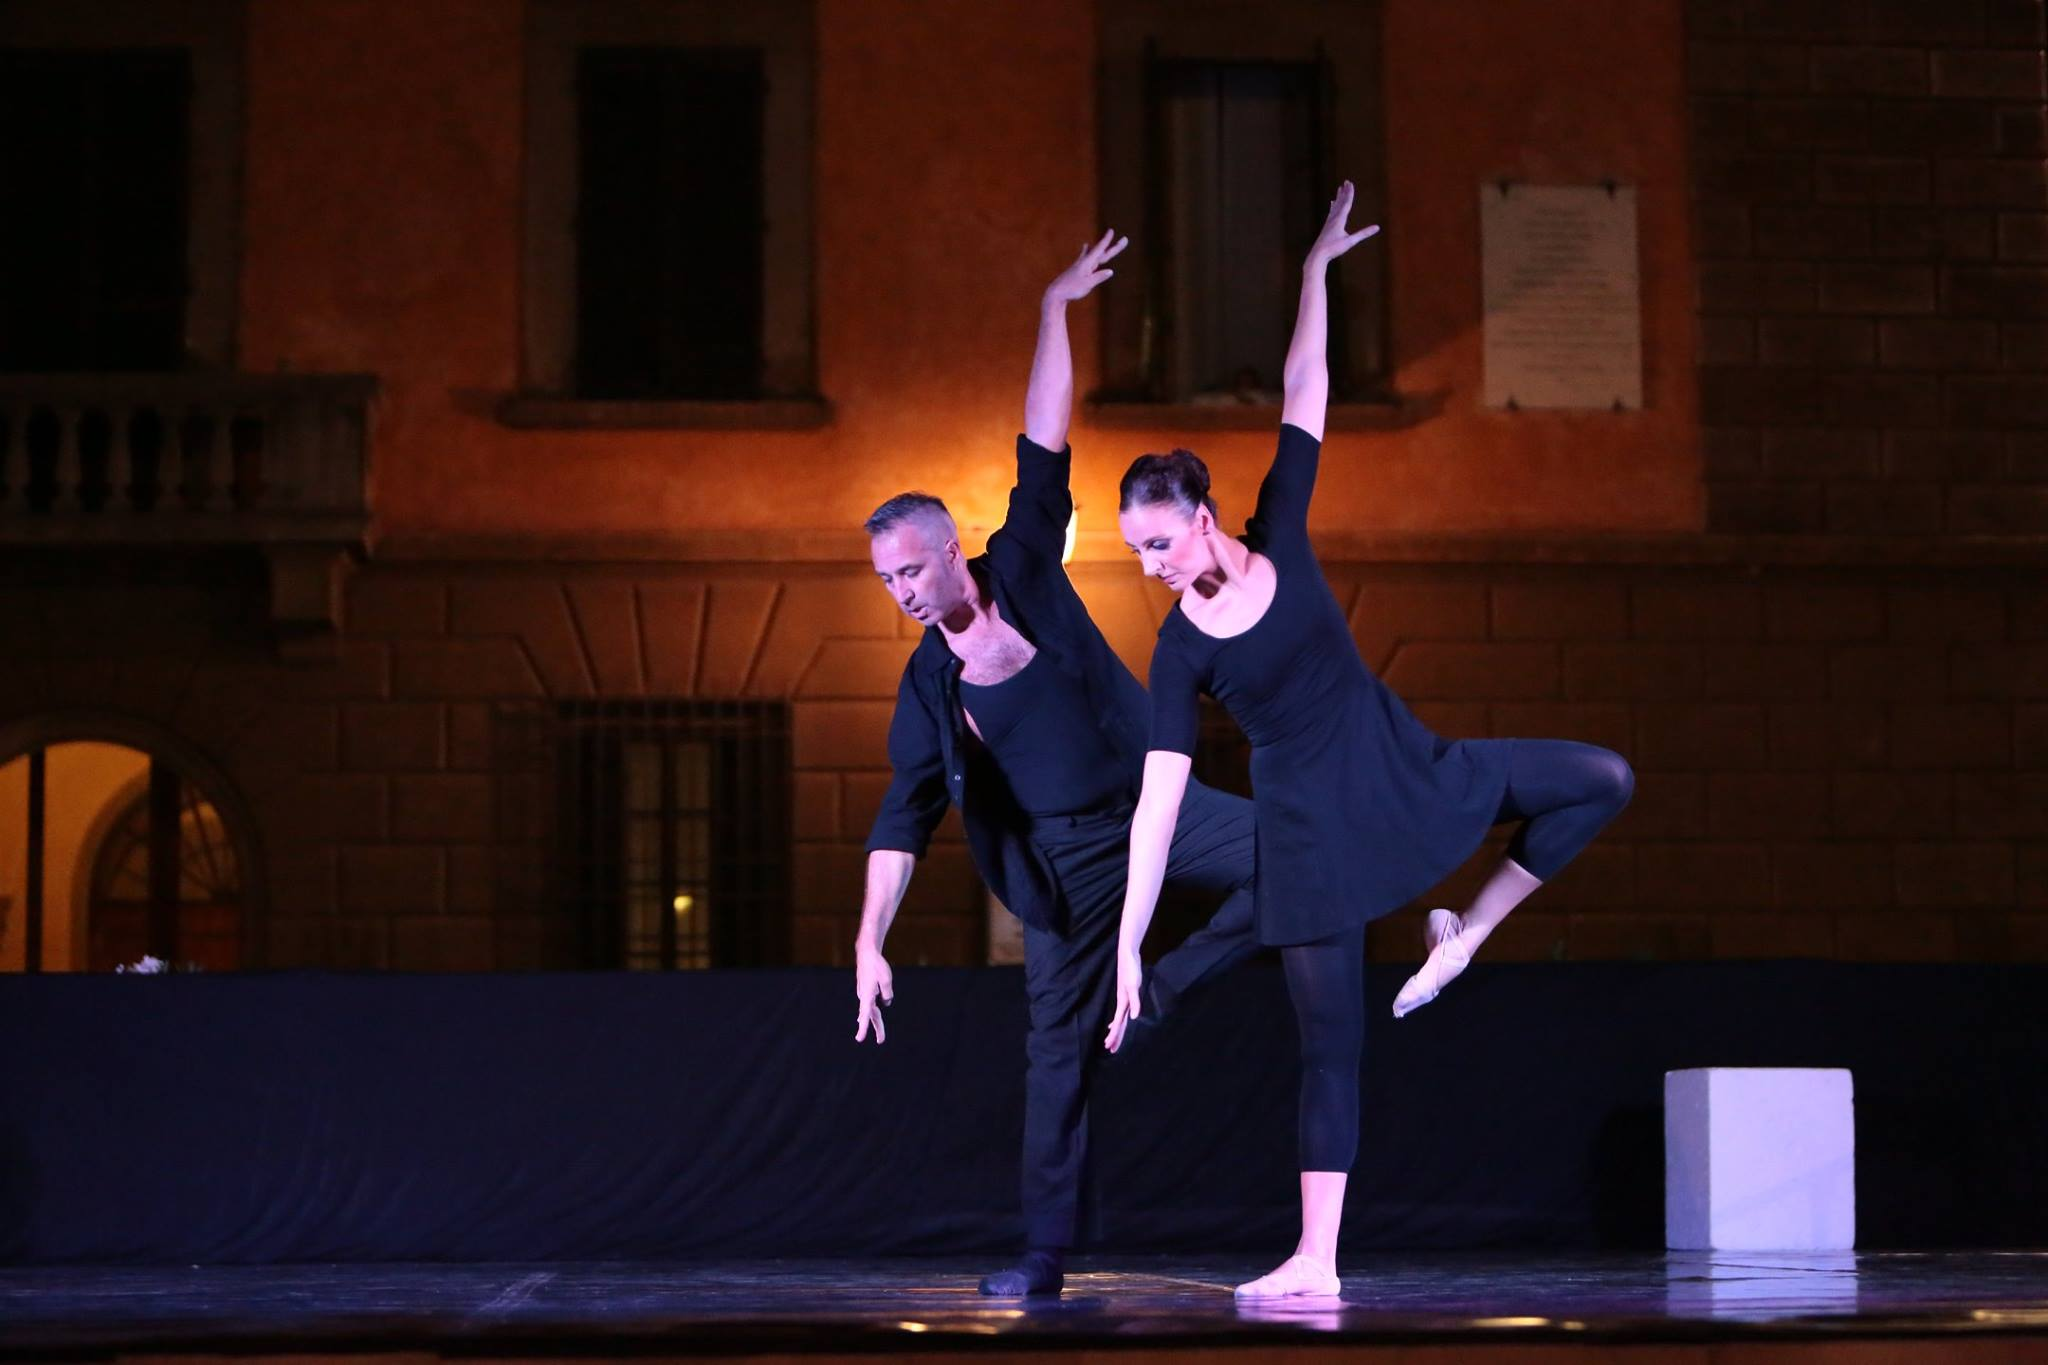 RAFFAELE MARINARI - Stage di Modern